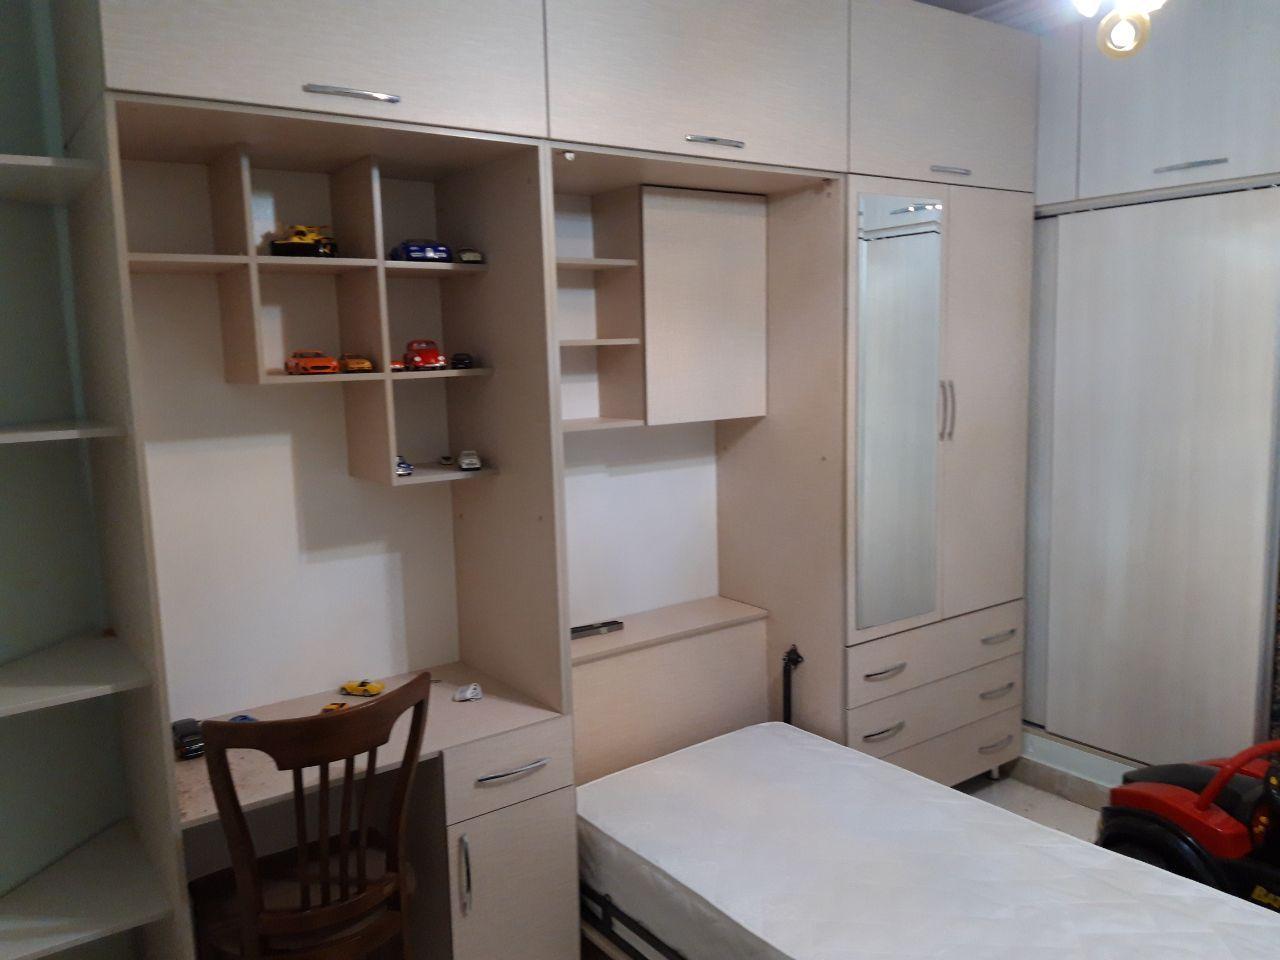 تخت کمجا /تخت تاشو/سرویس خواب/کمد /کمد دیواری/ انواع میز